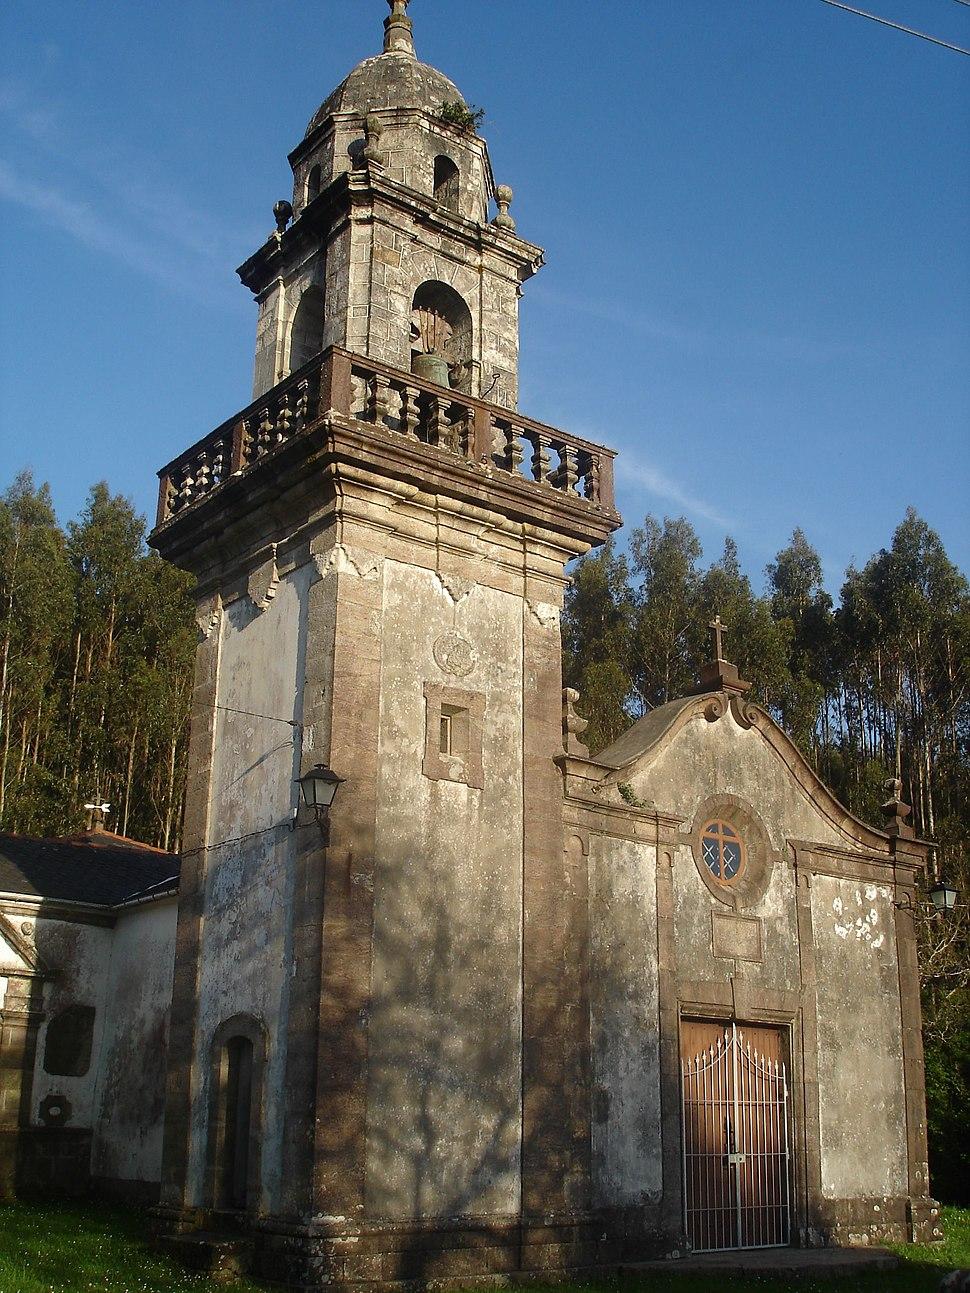 Igrexa de San Xurxo de Moeche